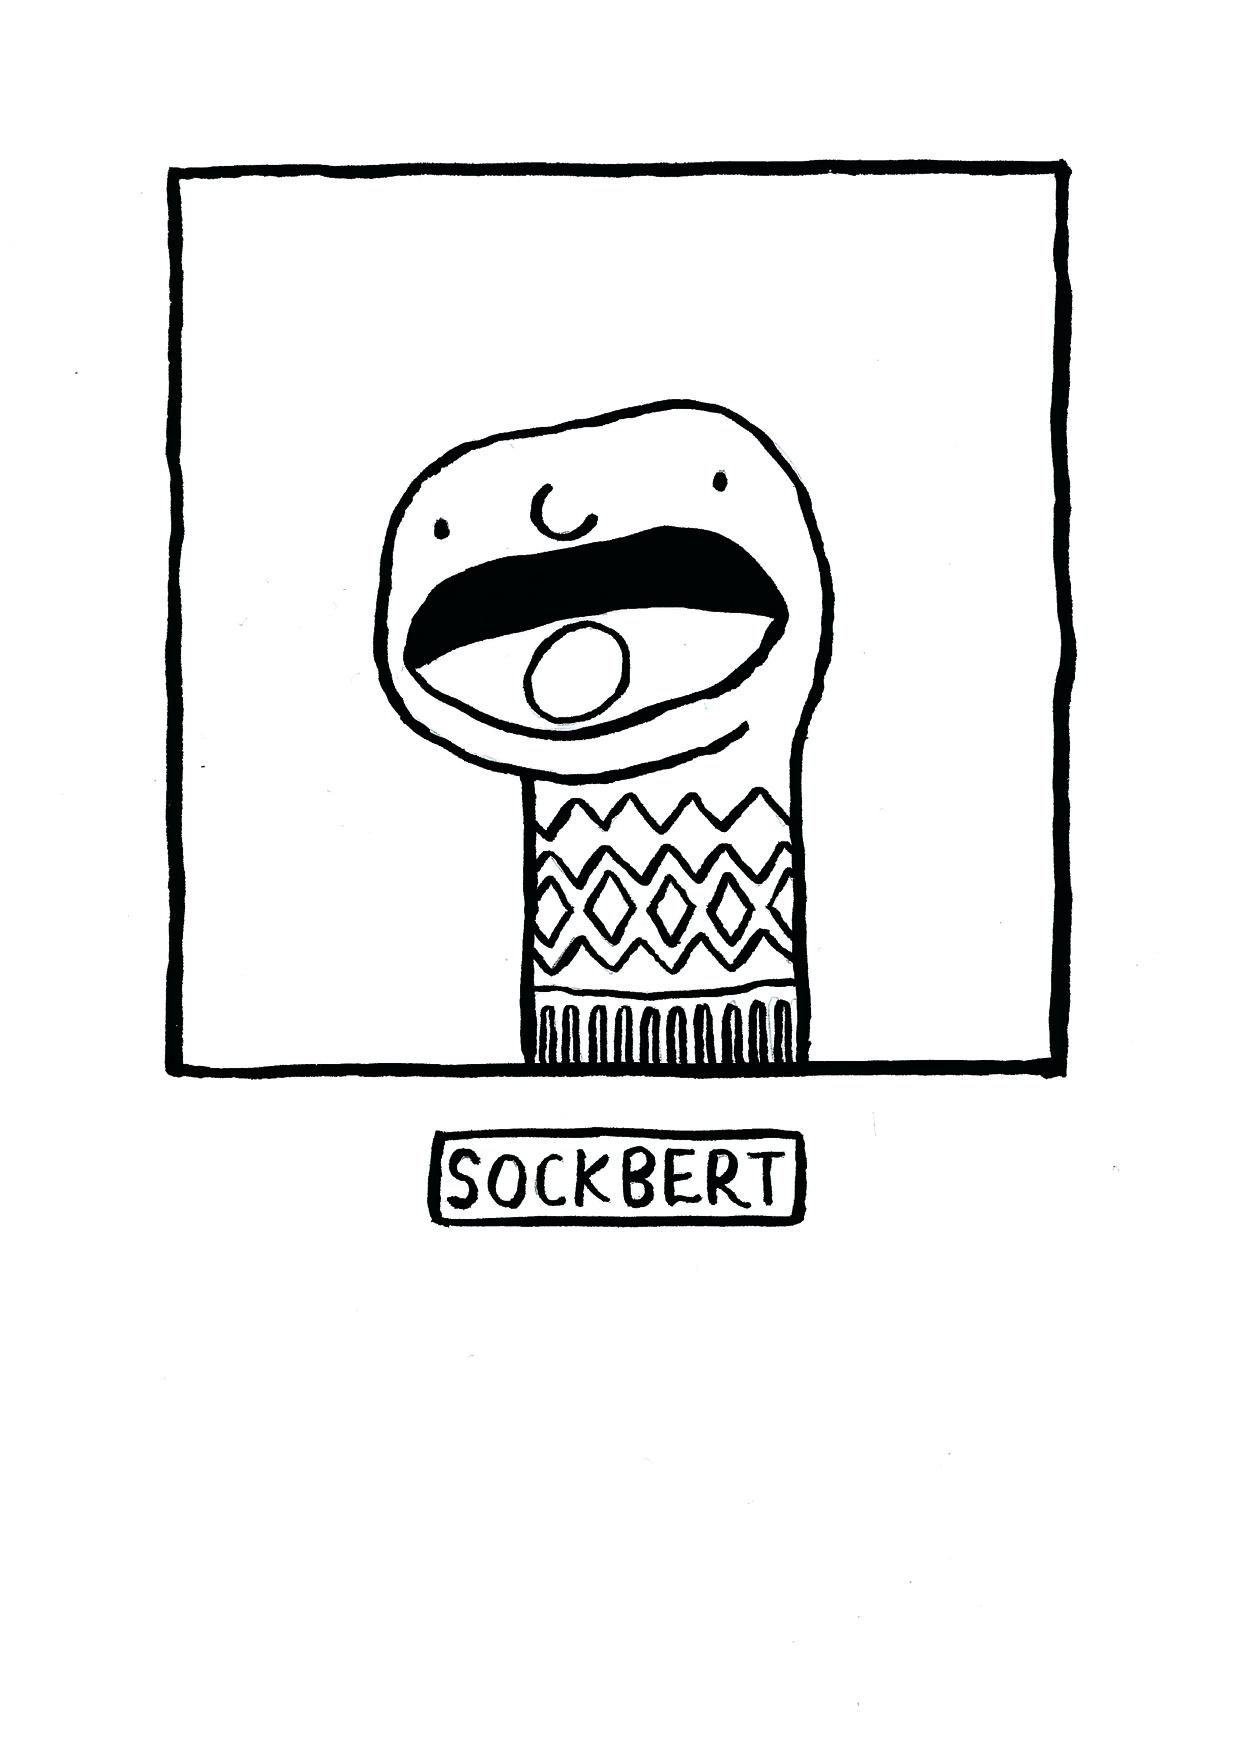 Sockbert